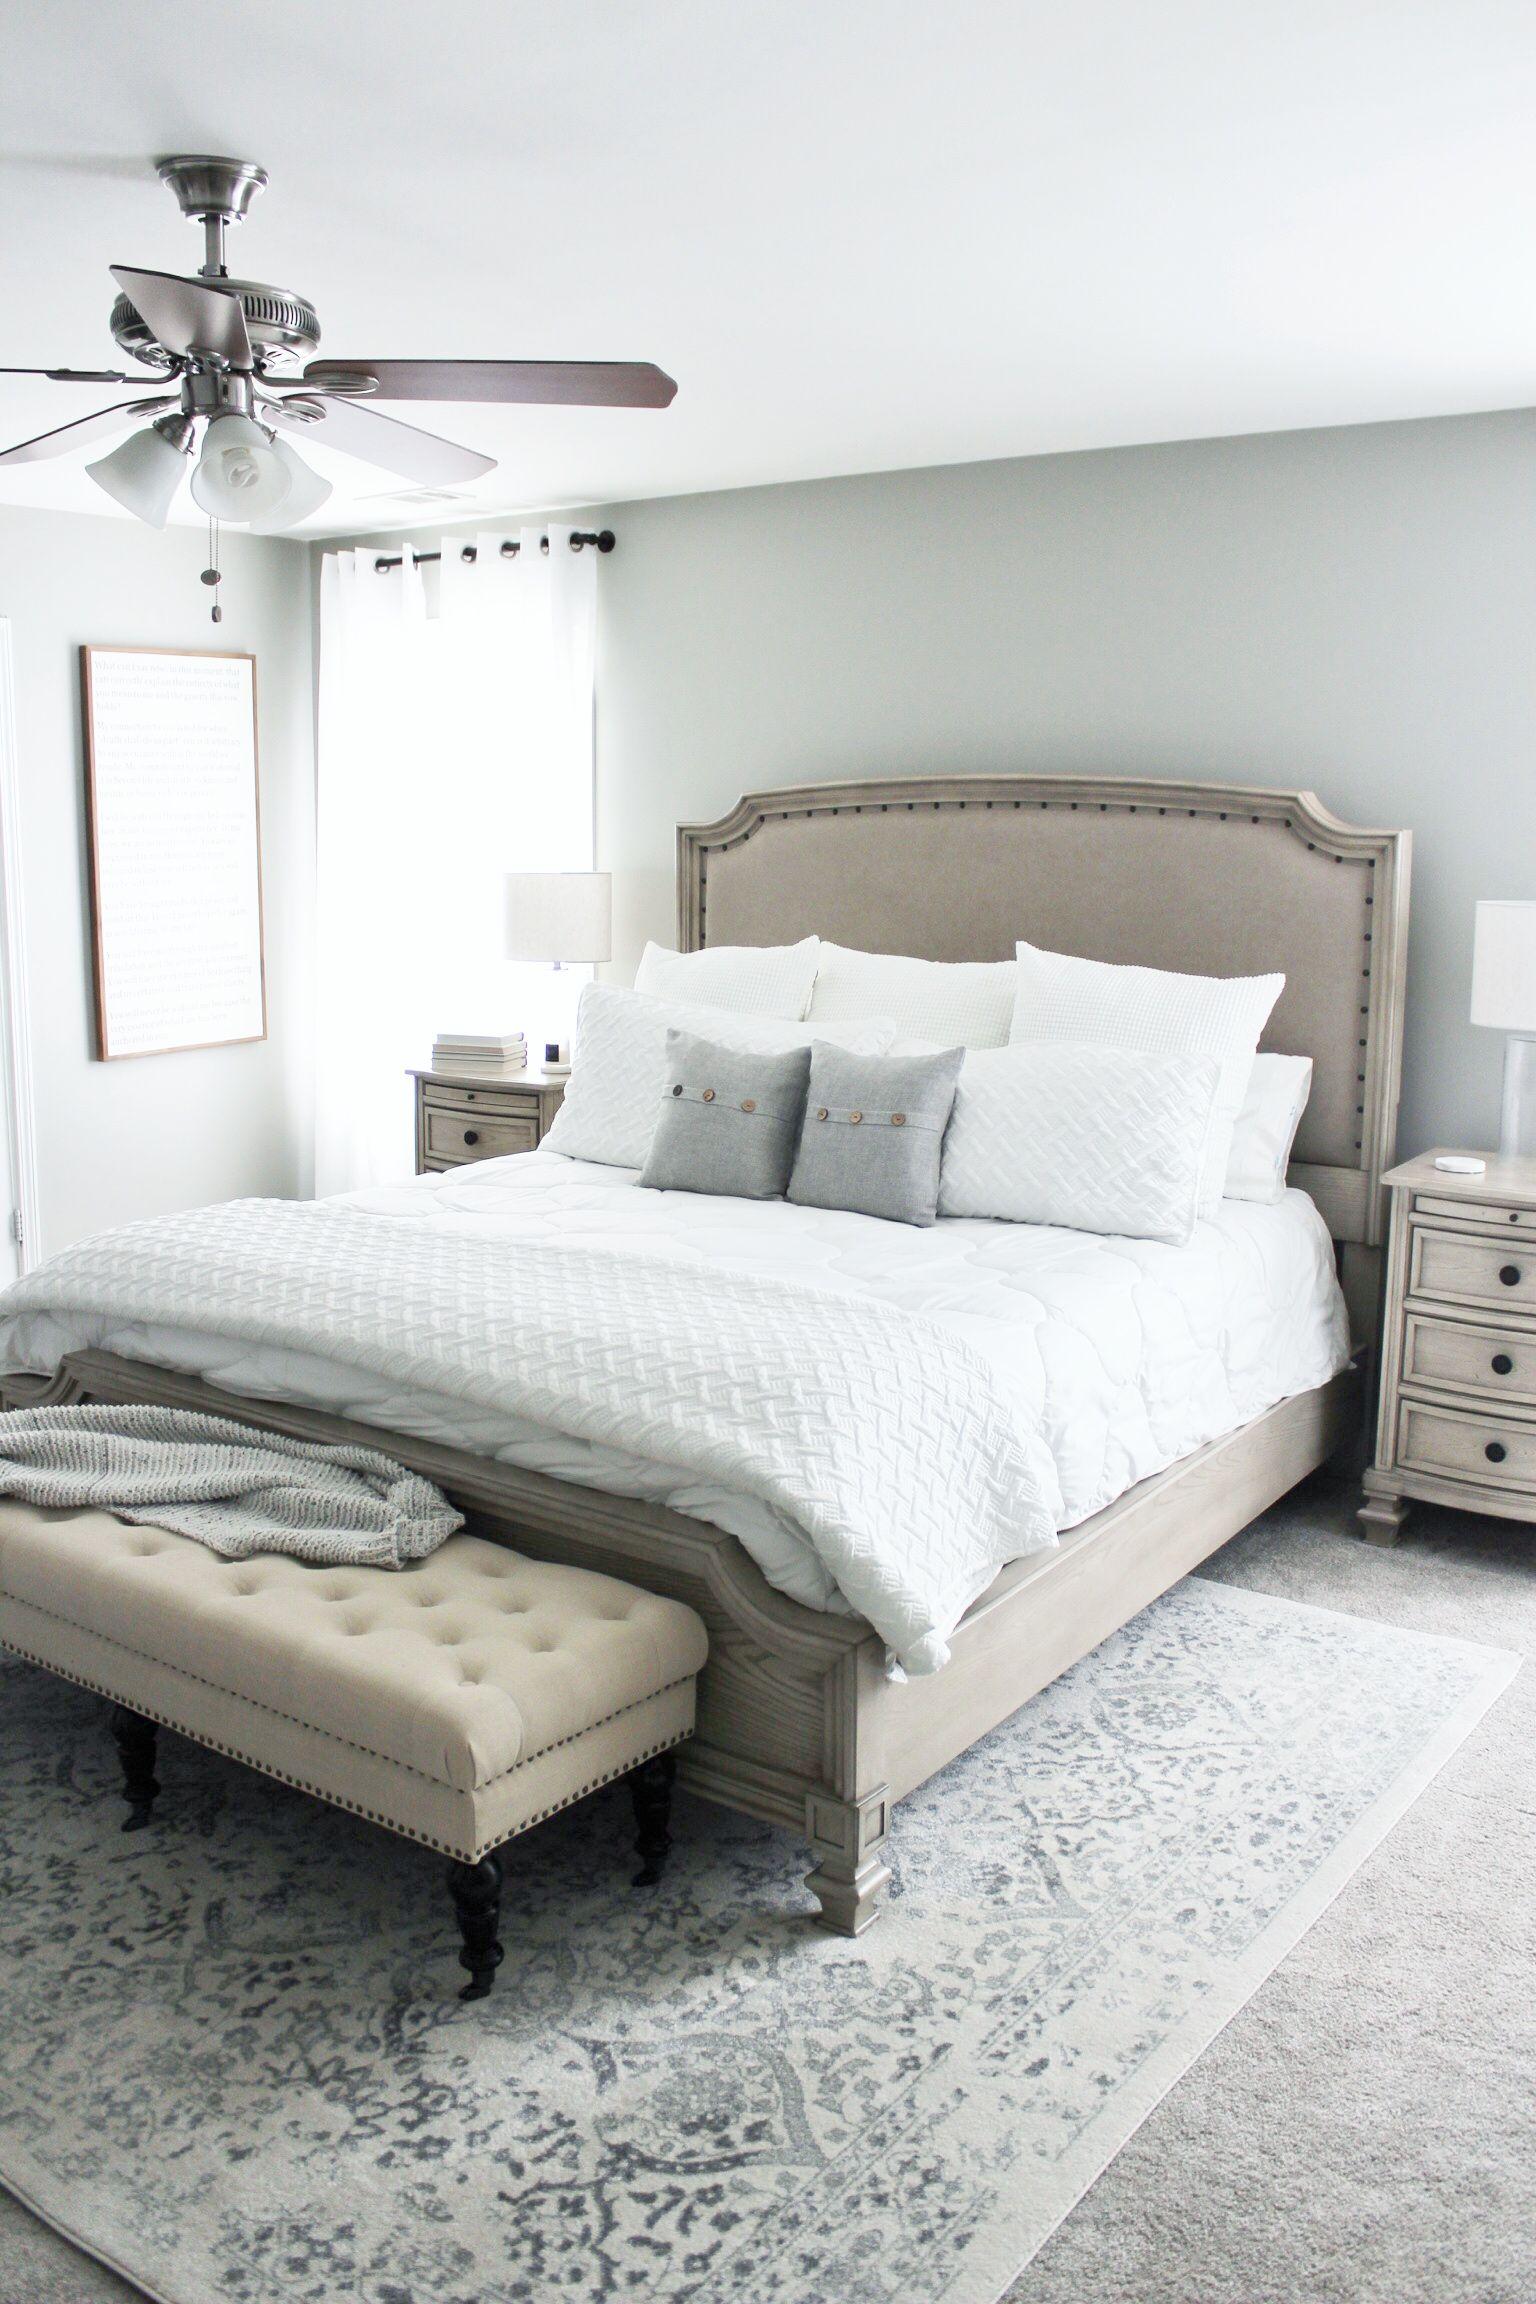 Demarlos Bedroom Set By Ashley Furniture Ashley Bedroom Furniture Sets Ashley Furniture Bedroom Bedroom Furniture Sets